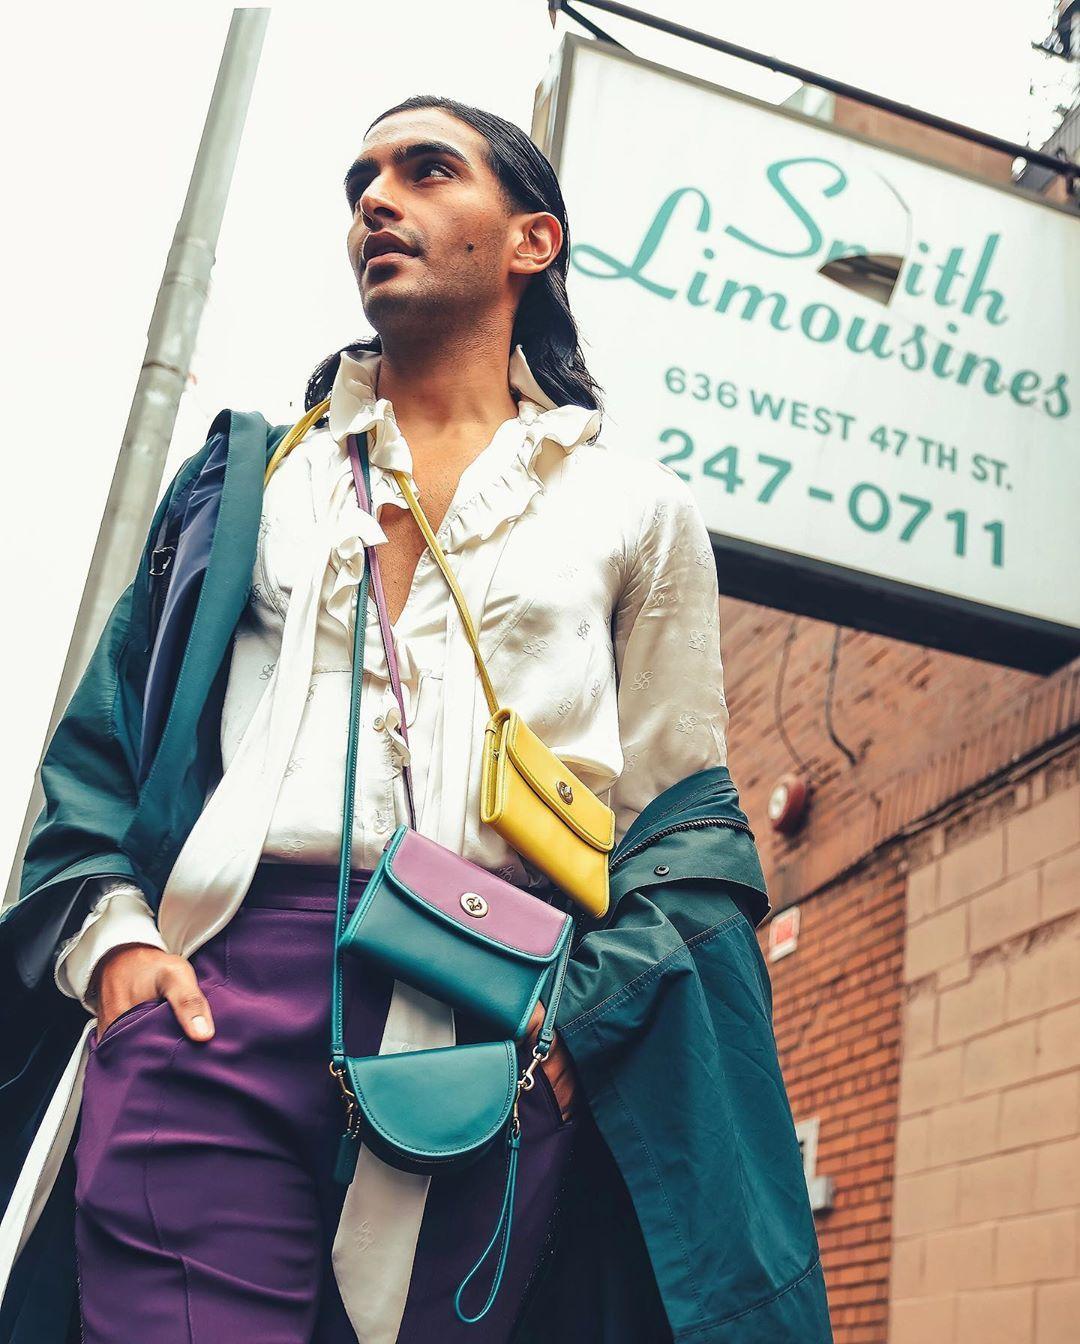 NYFW2020 with @rahi_chadda at @coach @nyfw #nyfw #nyfw2020 #fujifilm #fujifilmxt3 #streetphotography #portrait...NYFW2020 with @rahi_chadda at @coach @nyfw #nyfw #nyfw2020 #fujifilm #fujifilmxt3 #streetphotography #portrait #portraitphotography #fashionphotography #nyc #manhattan #newyork #newyorkcity #fashion #style #gorgeous #color #ilovefashion #beauty #coach #icapture_nyc #newyork_ig #nyconline #newyork_originals #thisisnewyorkcity